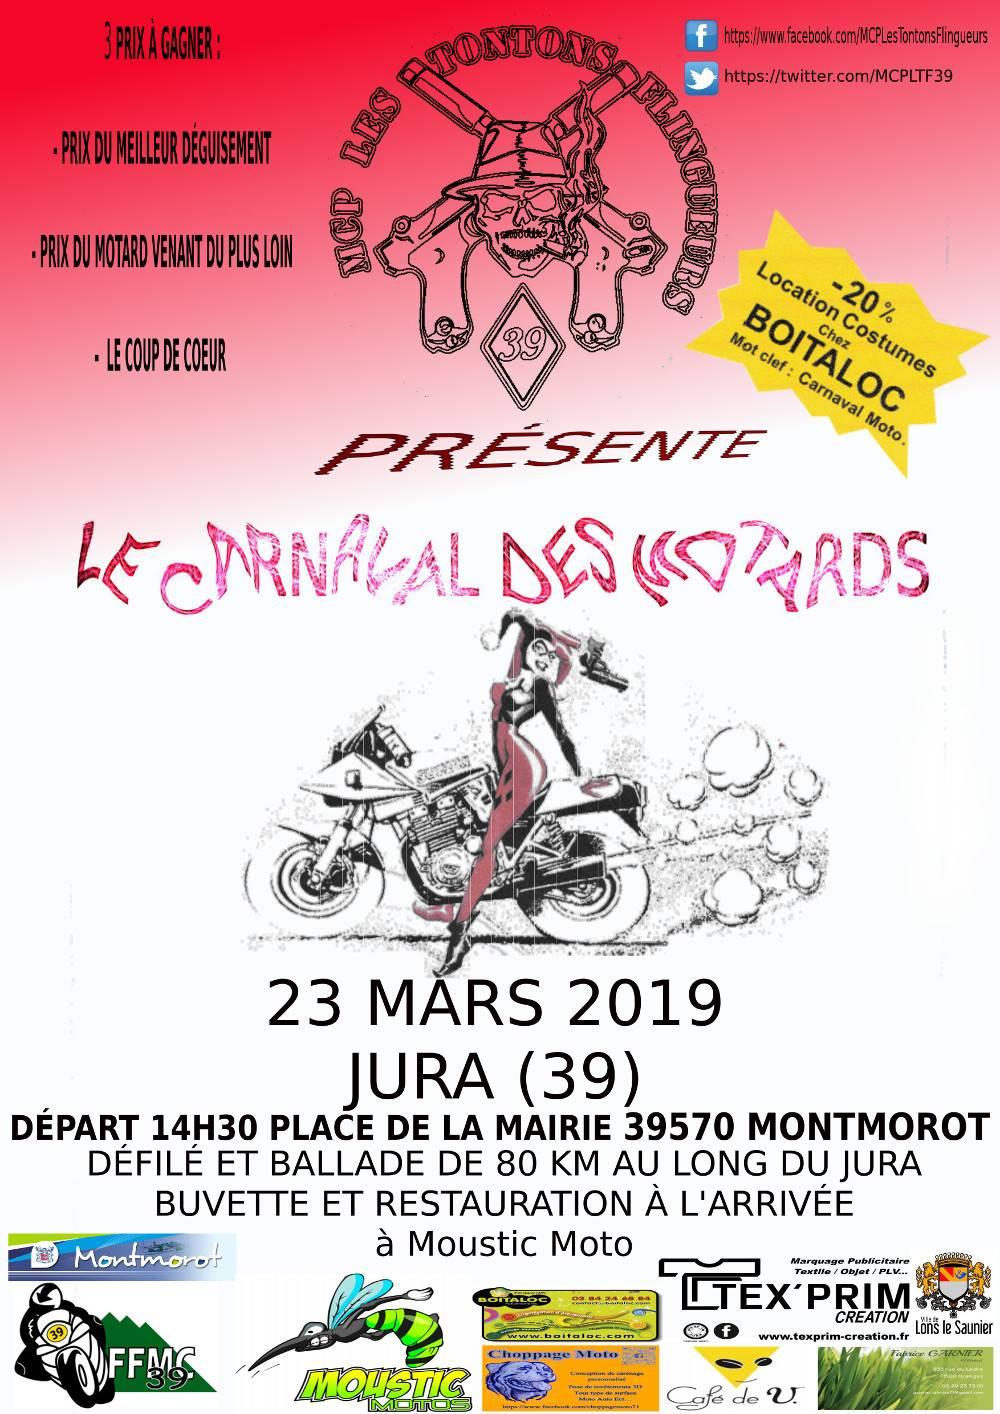 Carnaval des motards by Les Tontons Flingueurs